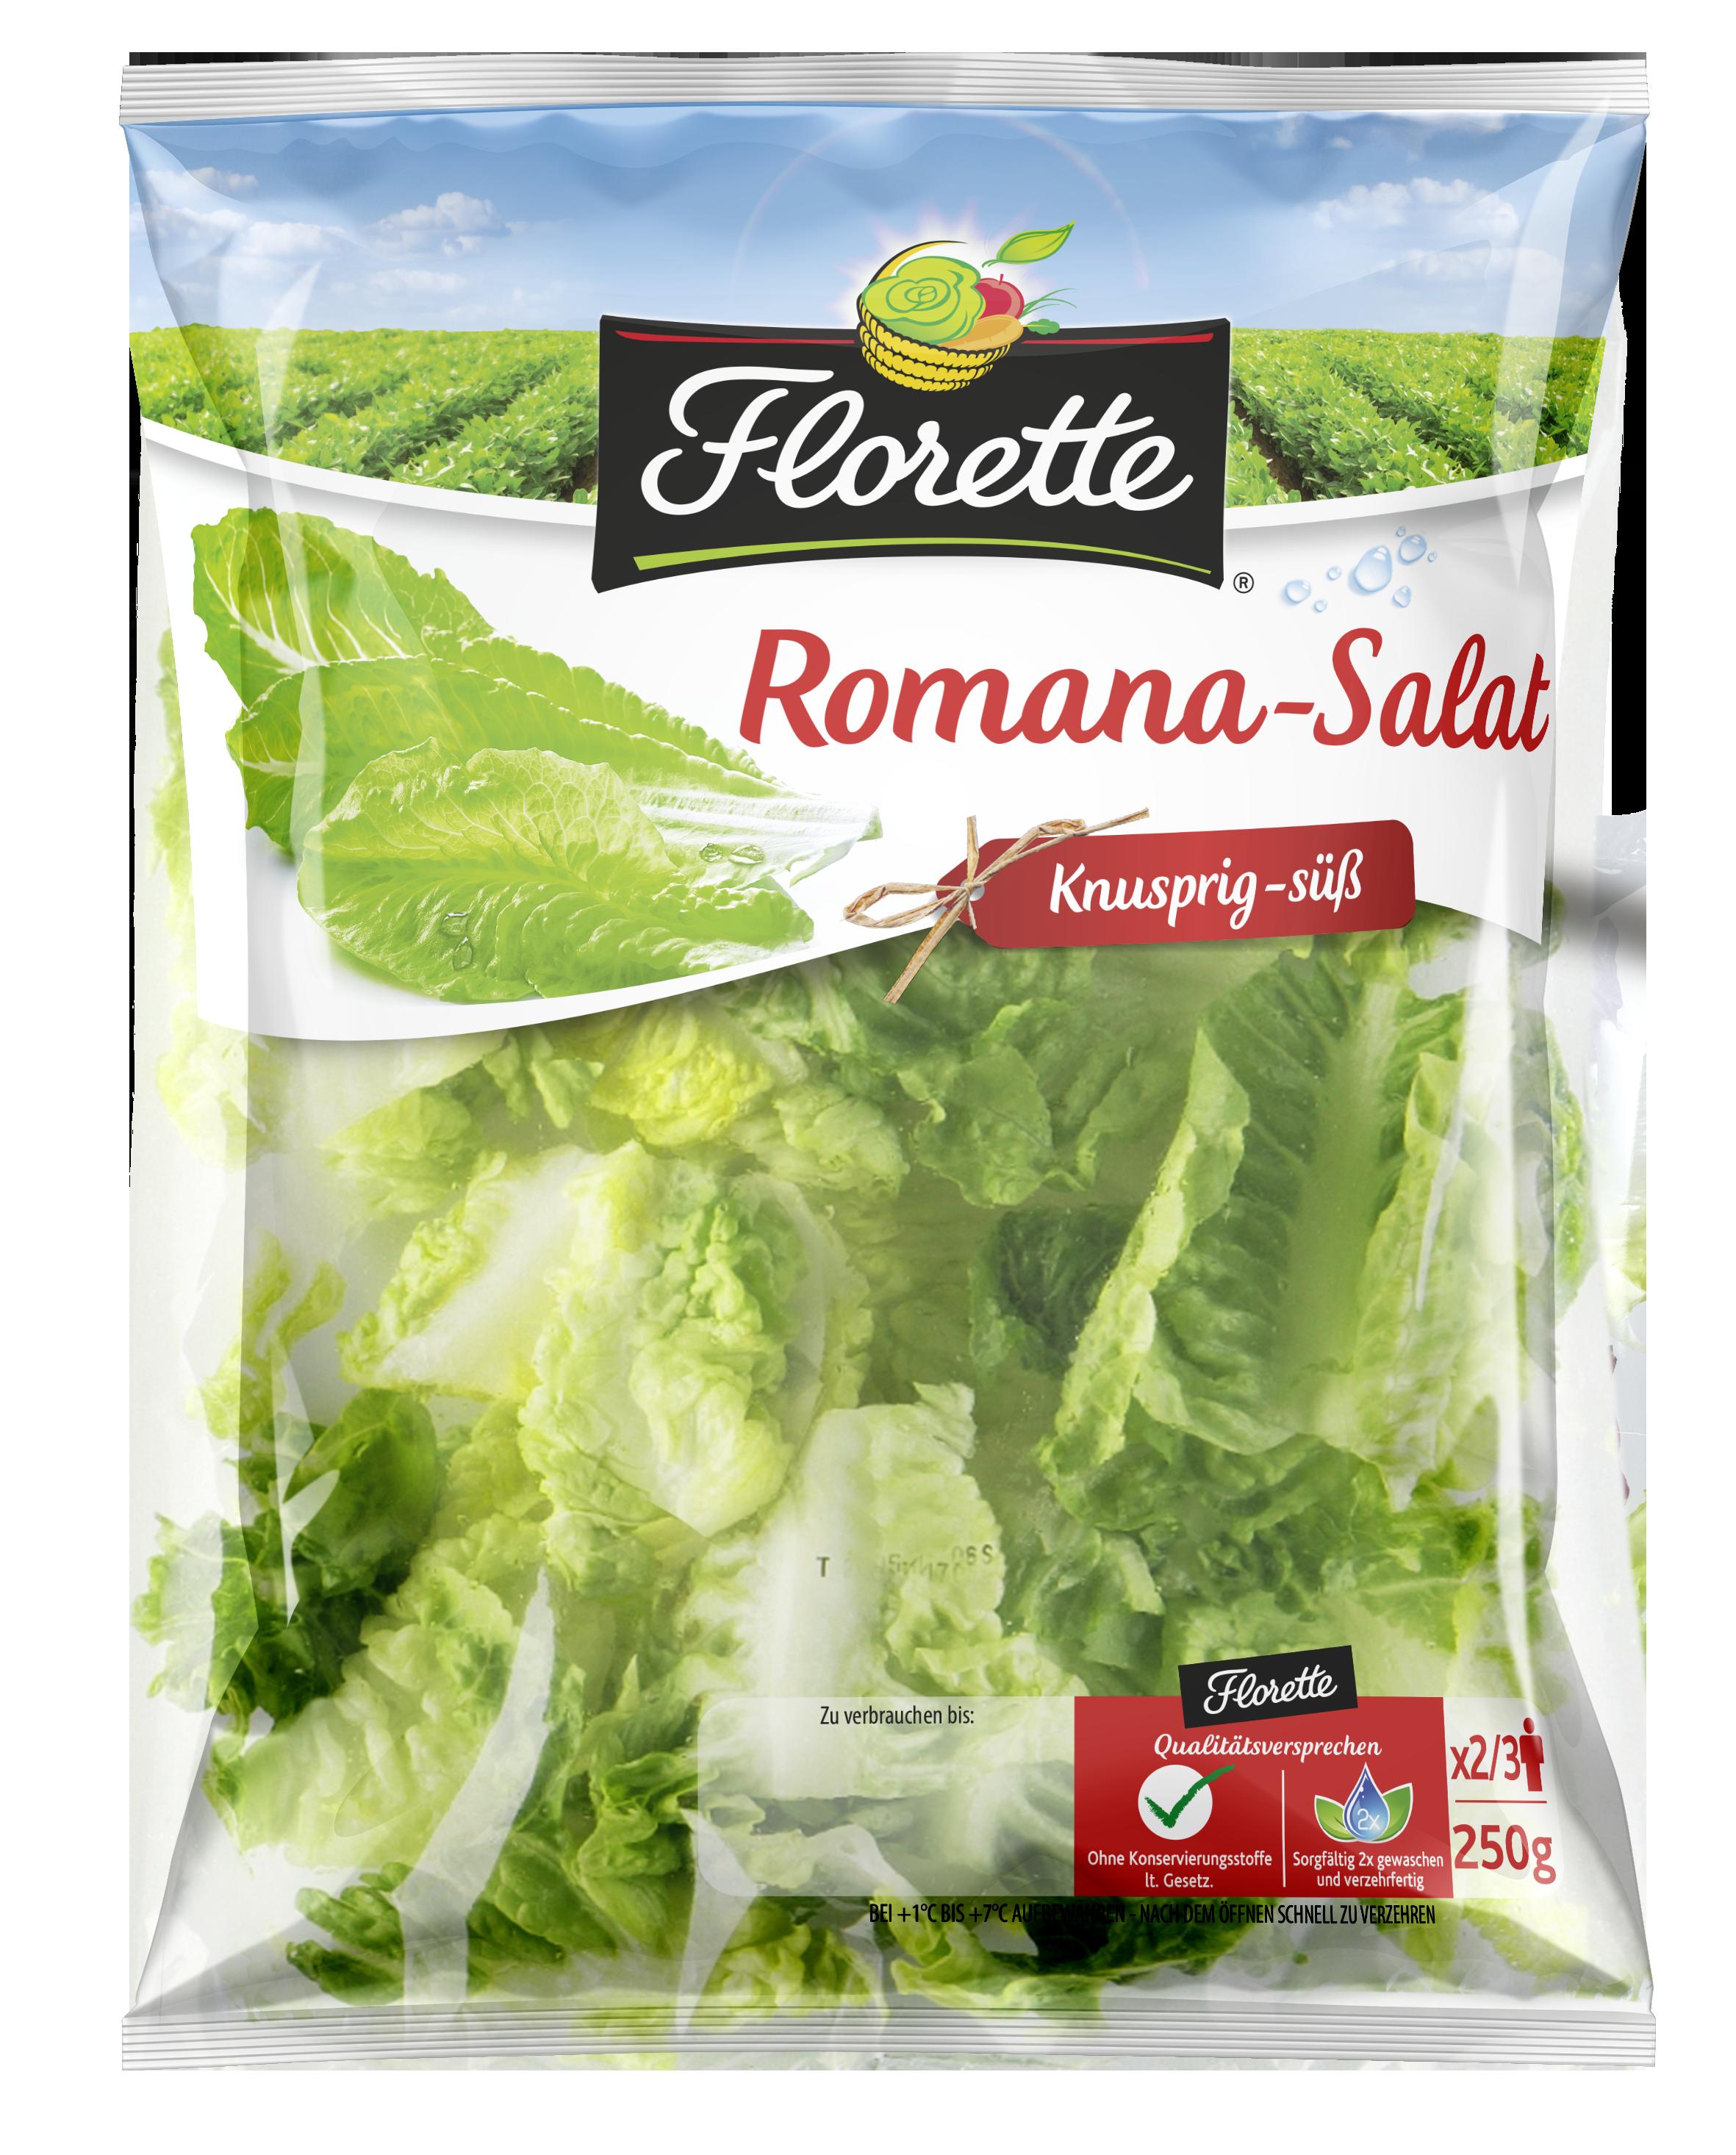 Romana-Salat von Florette